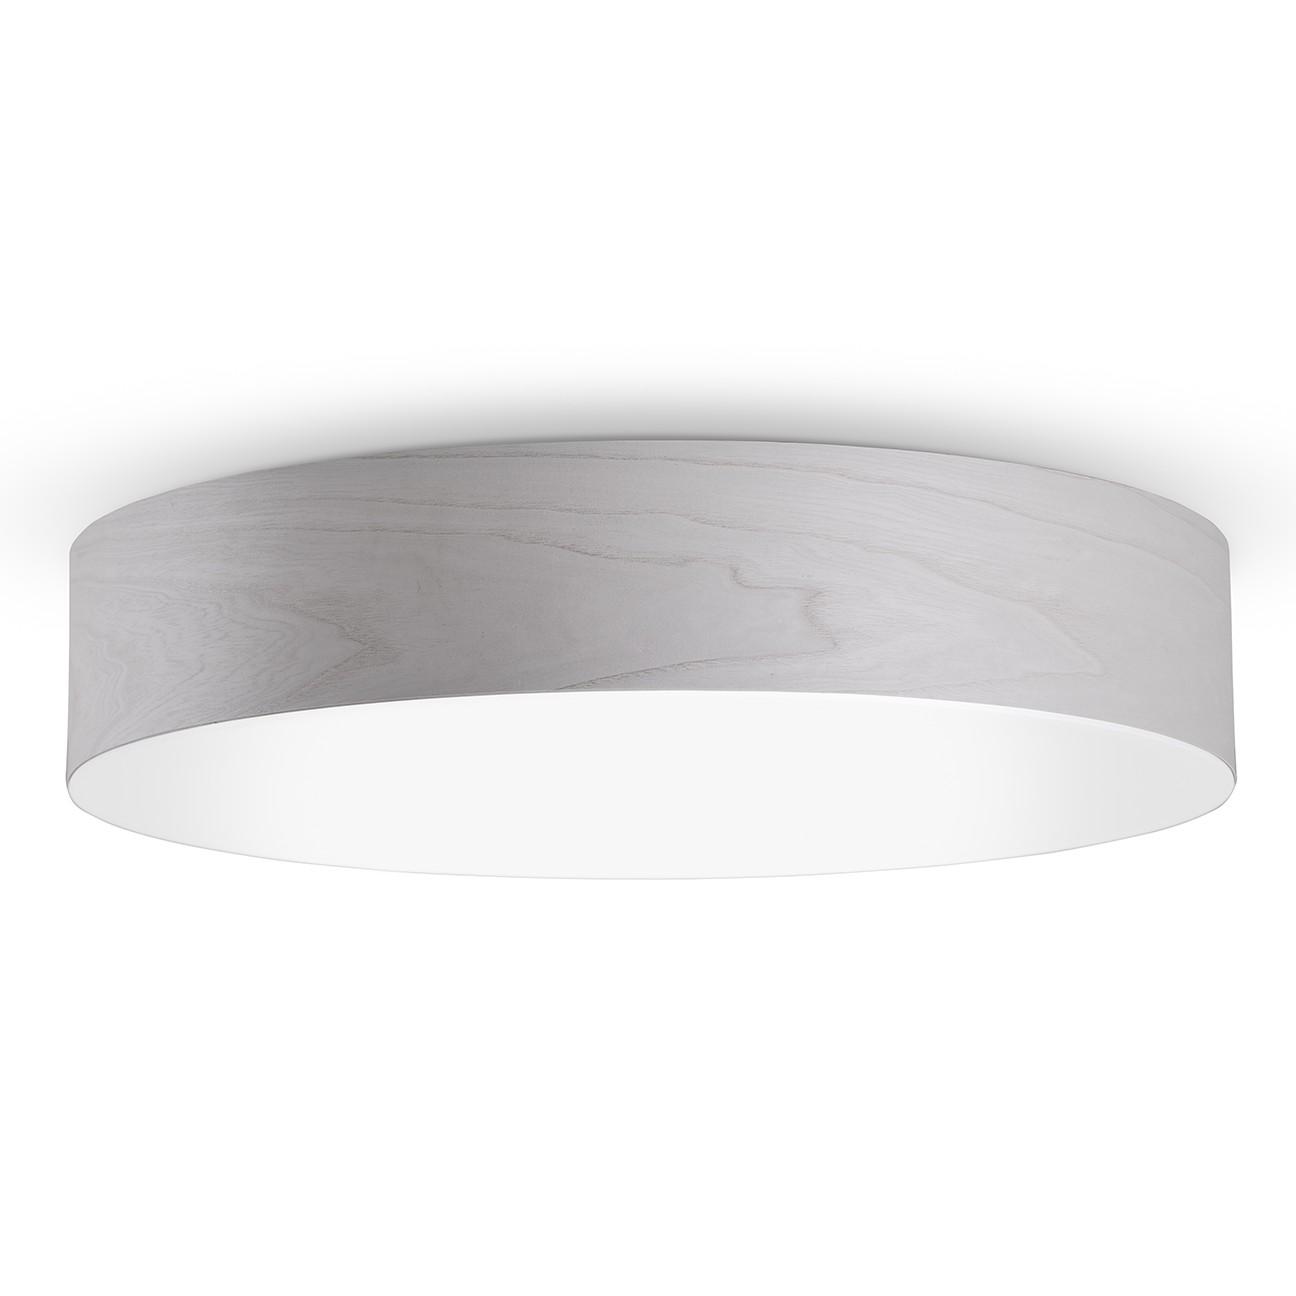 home24 LED-Deckenleuchte Veneli